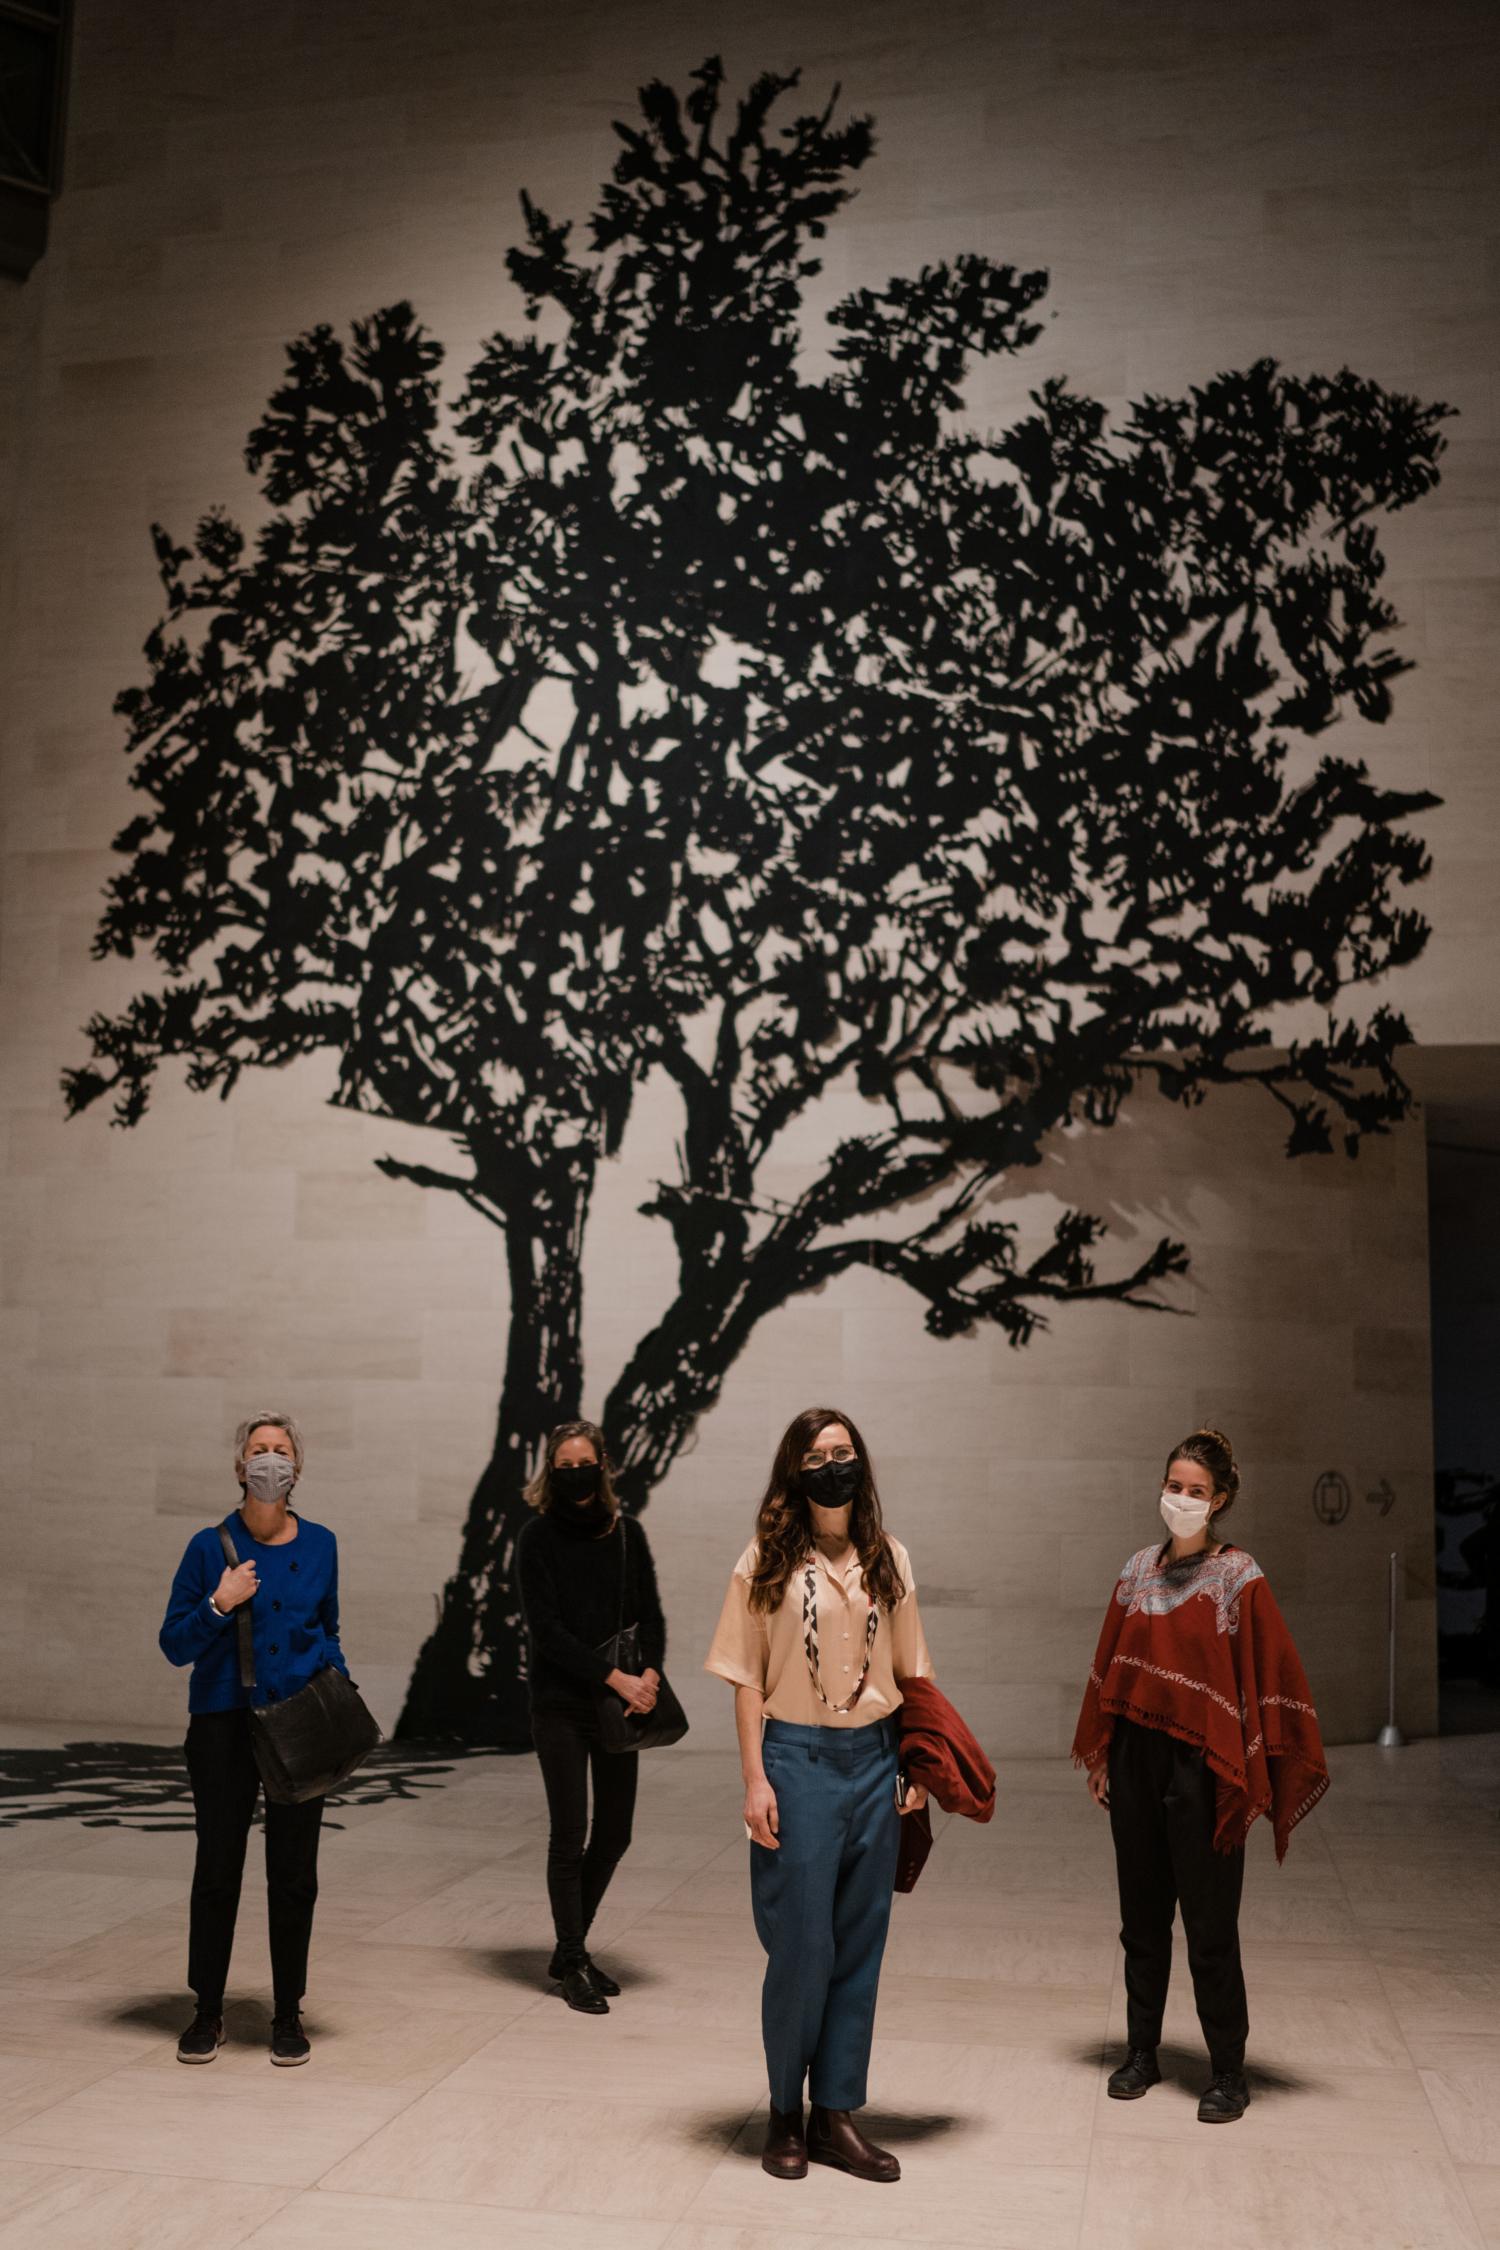 Sabine Theunissen et ses collaboratrices pour l'exposition de William Kentridge au Mudam